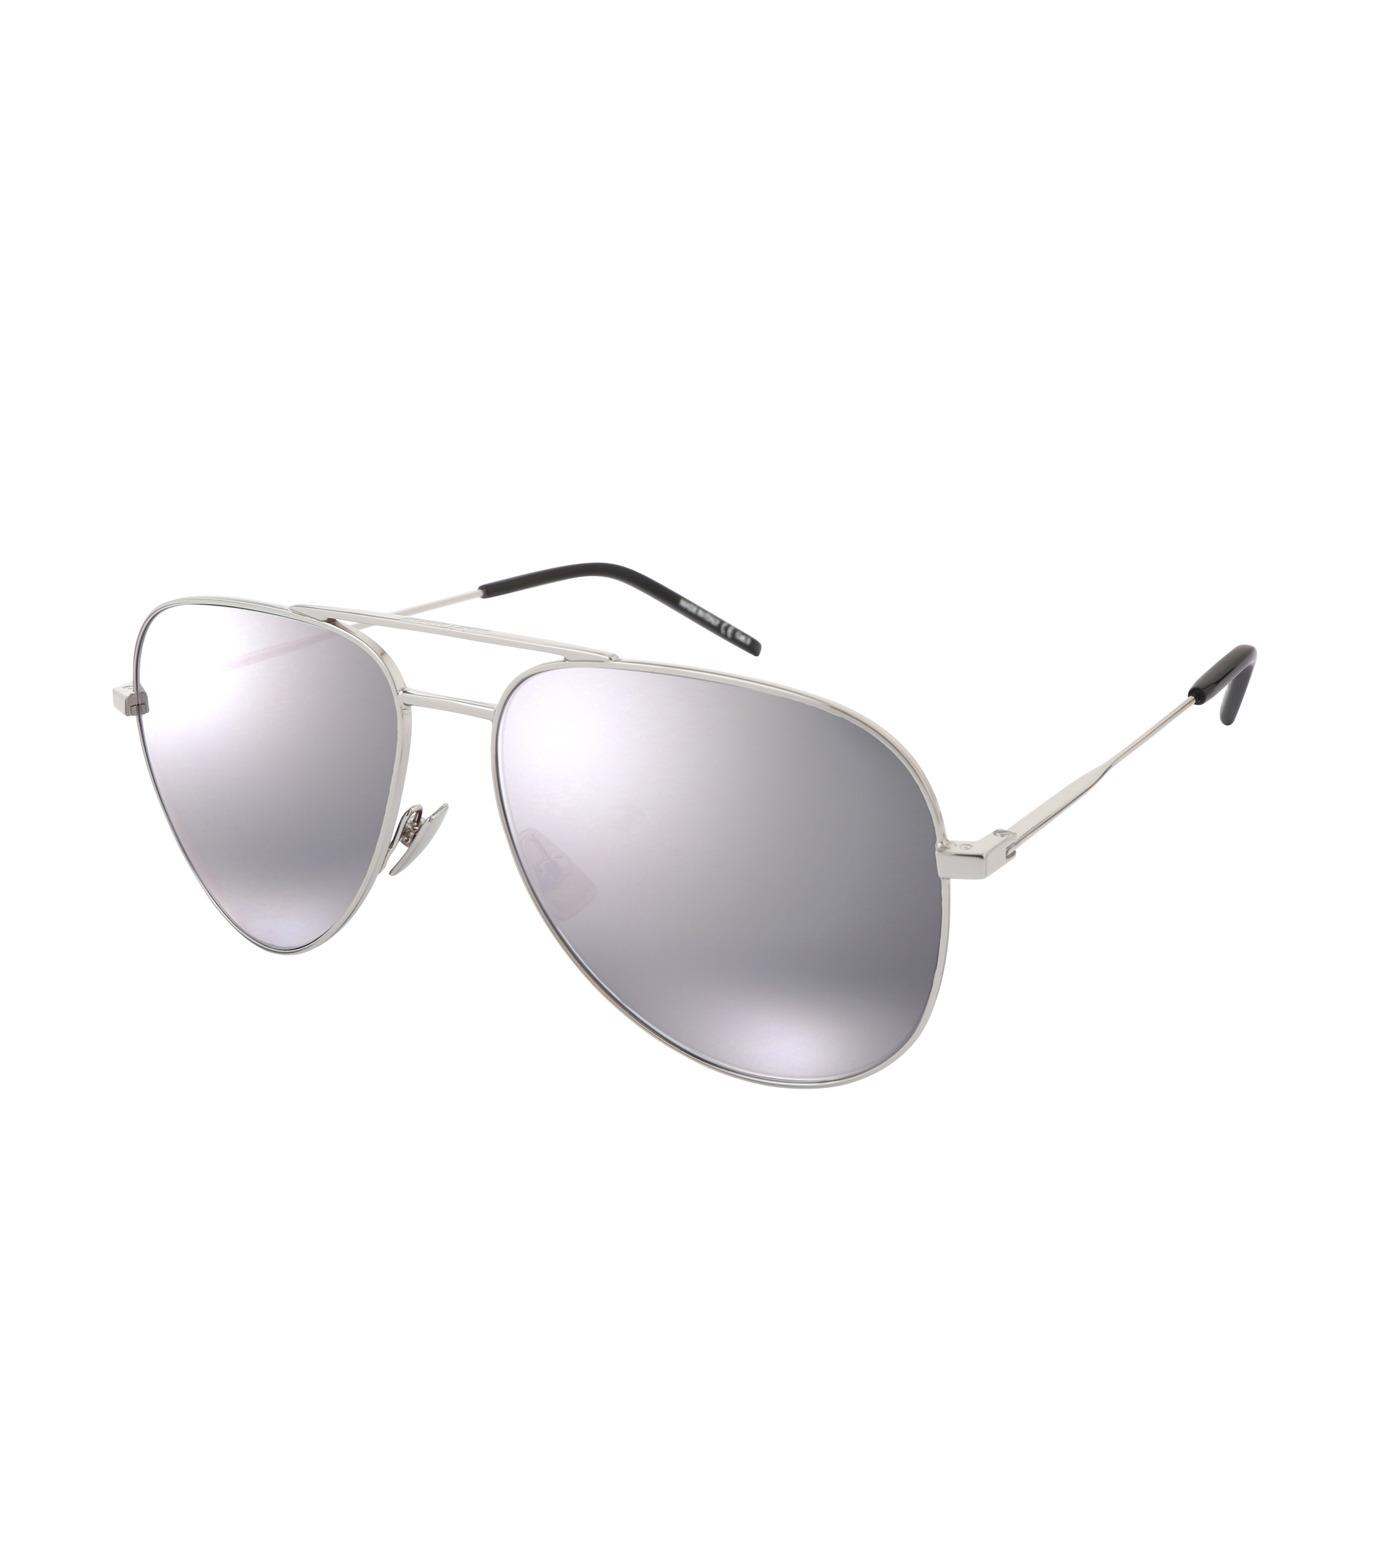 SAINT LAURENT(サンローラン)のClassic 11 Mens Teardrop-SILVER(アイウェア/eyewear)-419696-1 拡大詳細画像1